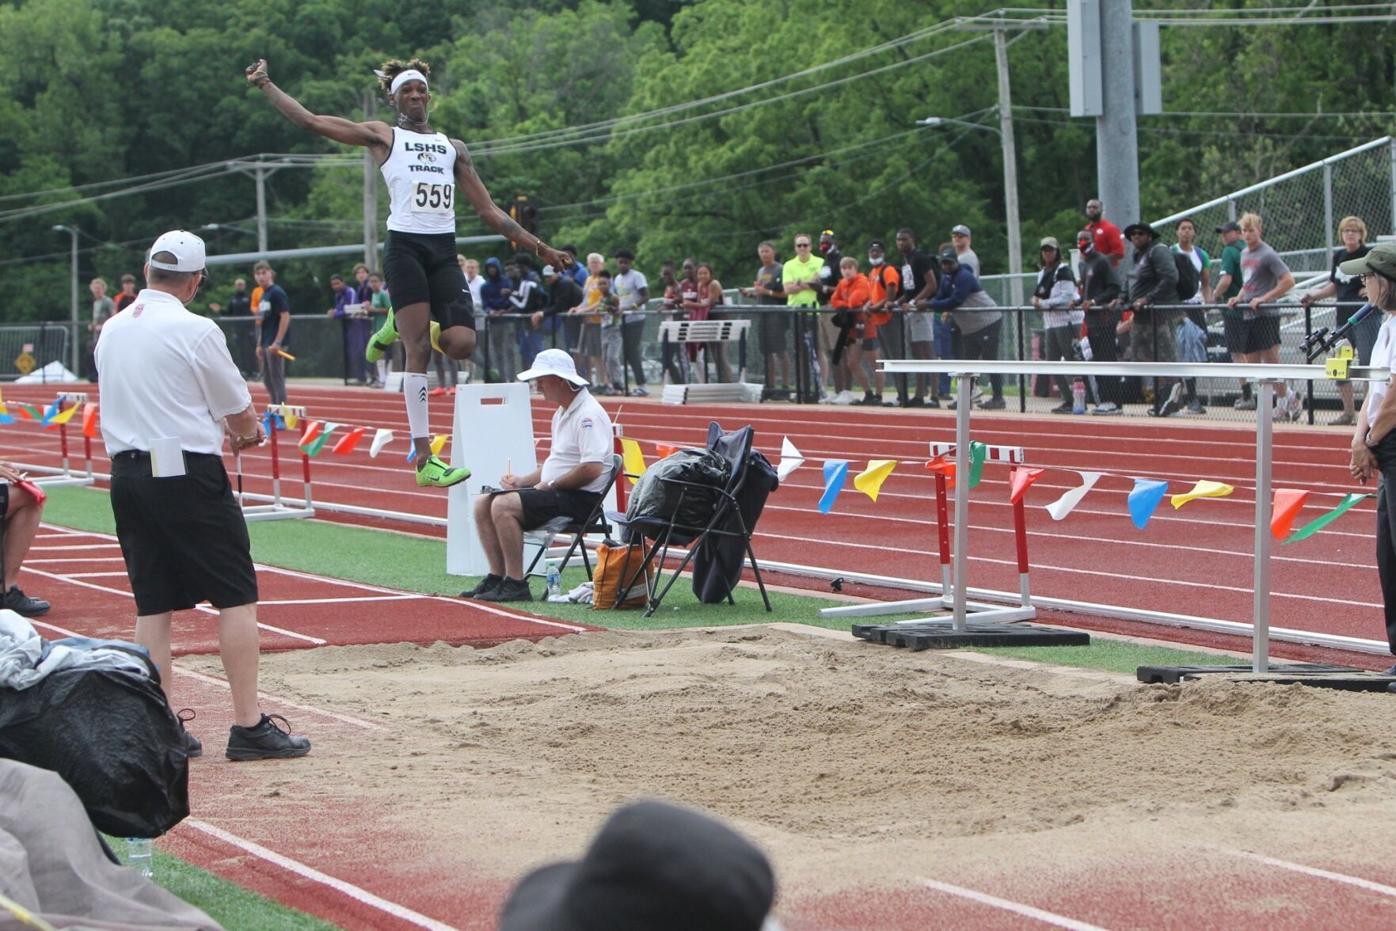 Johnny Brackins Jr. jump